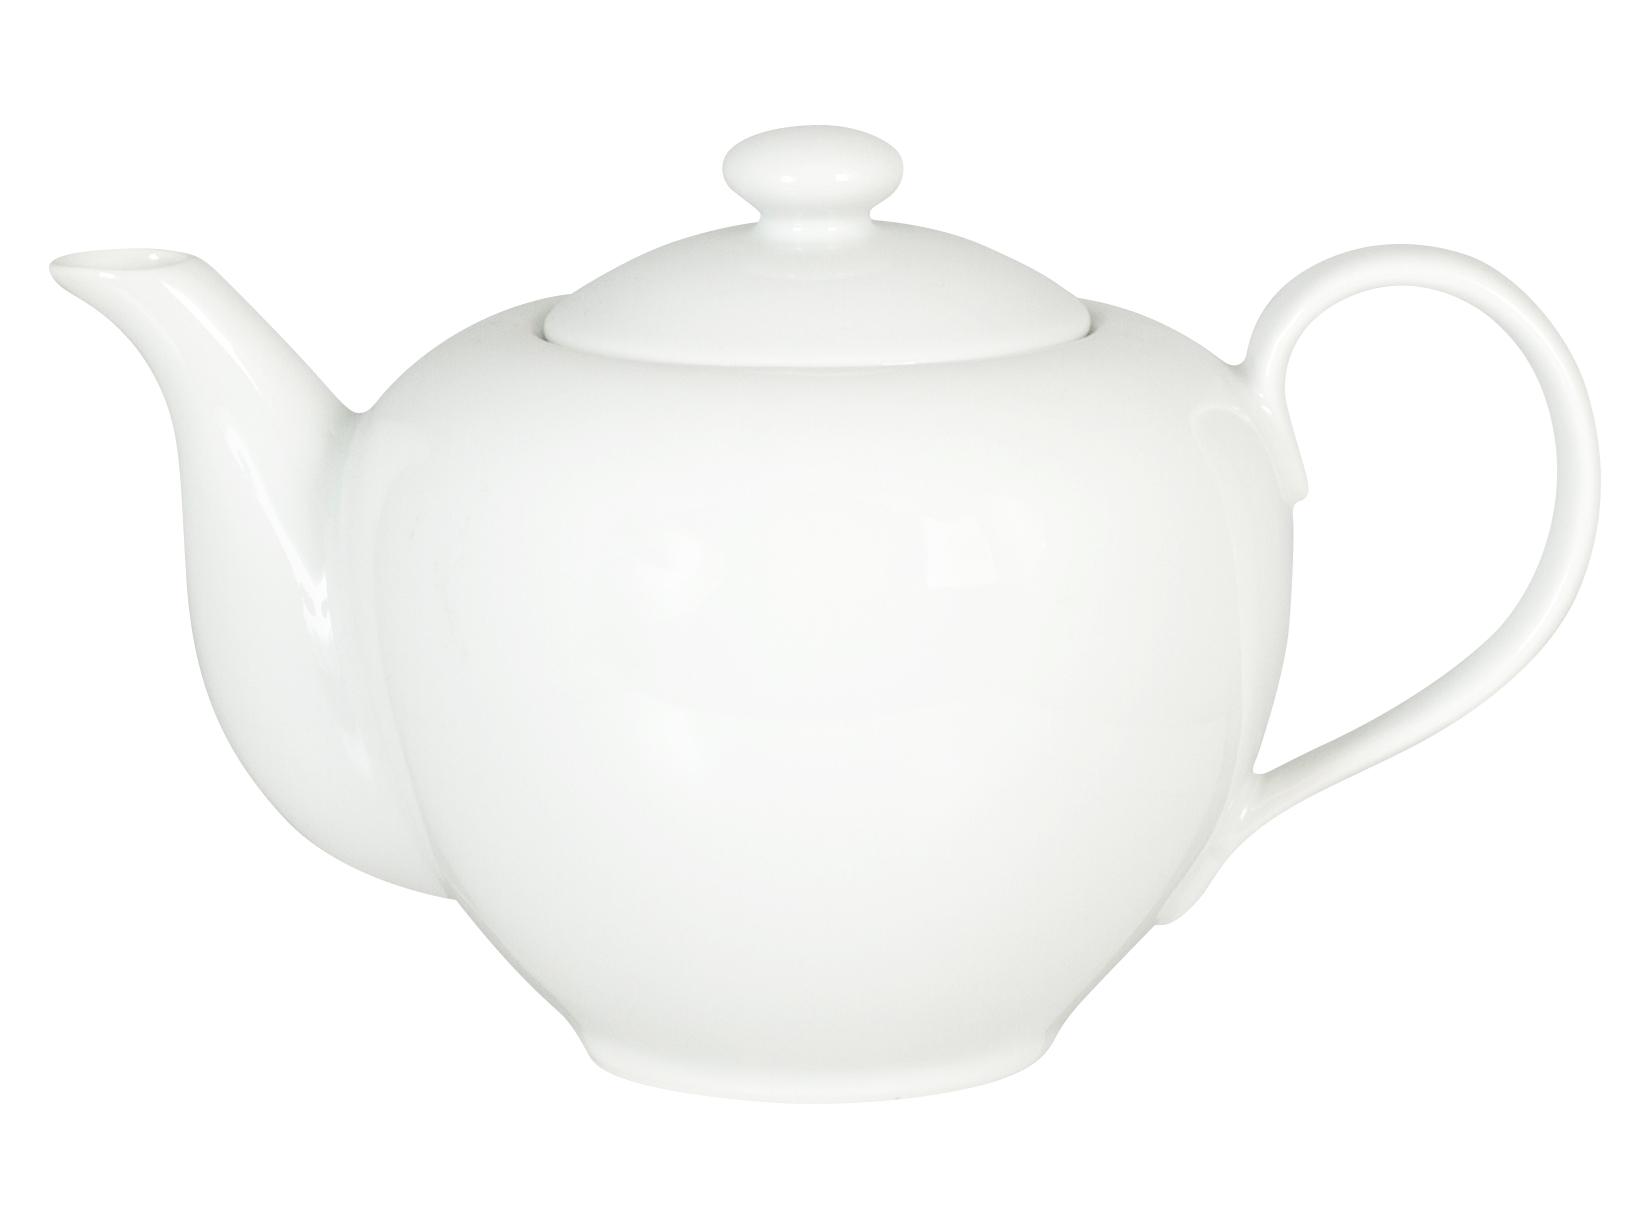 Teiera In Porcellana, 1.1 L, Bianco